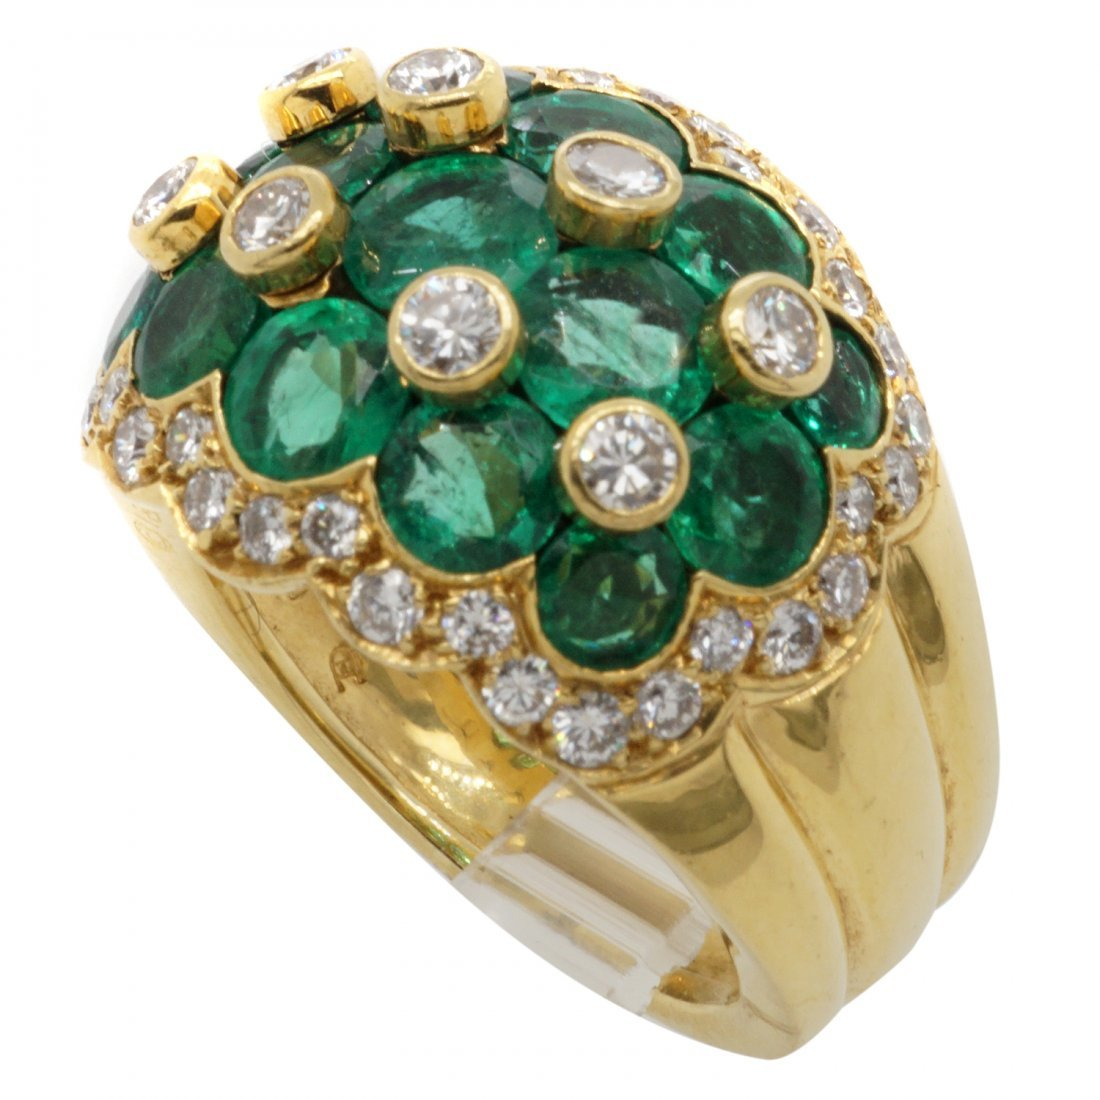 Van Cleef & Arpels Emerald Diamond 18 Karat Gold Ring